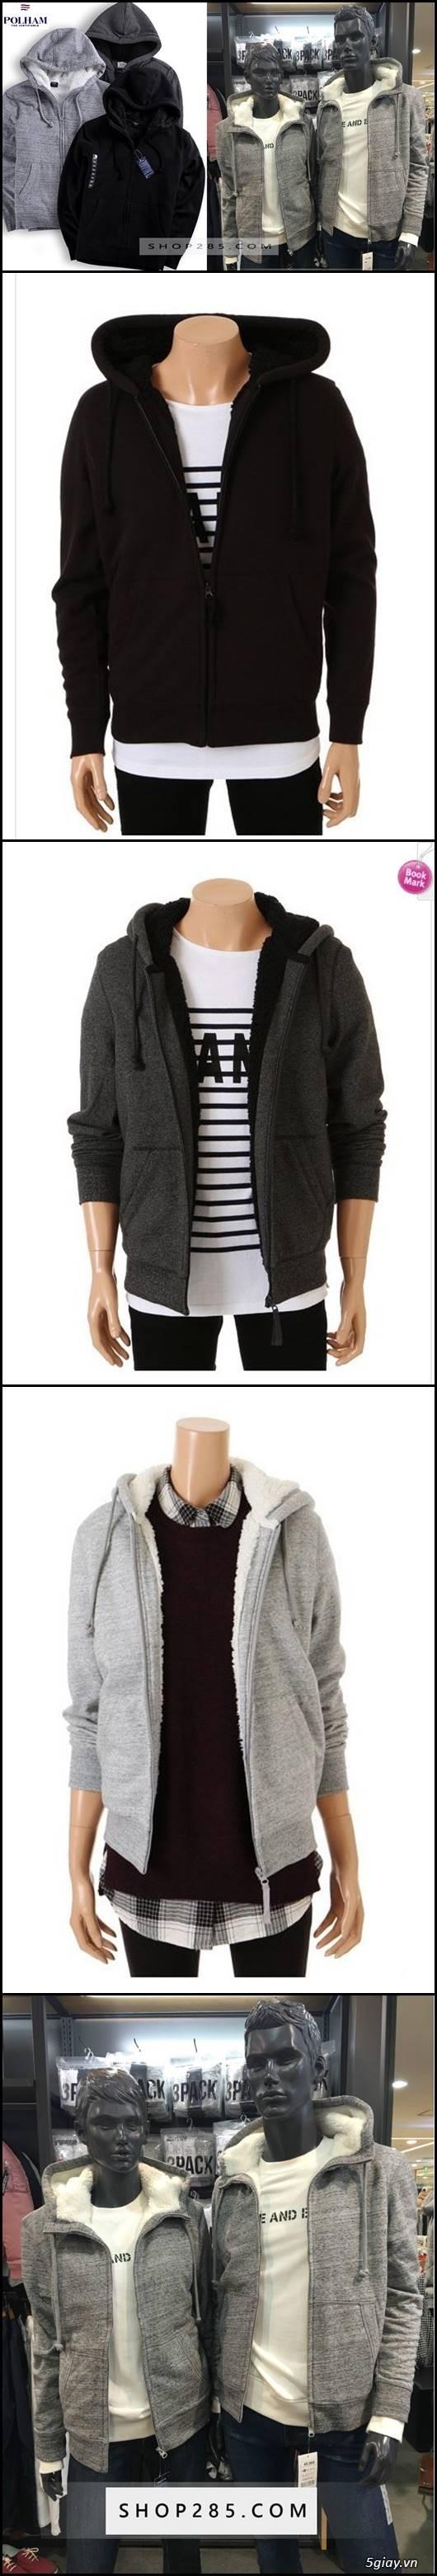 Shop285.com - Shop quần áo : Zara,Jules,Jake*s,,Hollister,Aber,CK,Tommy,Levis - 25